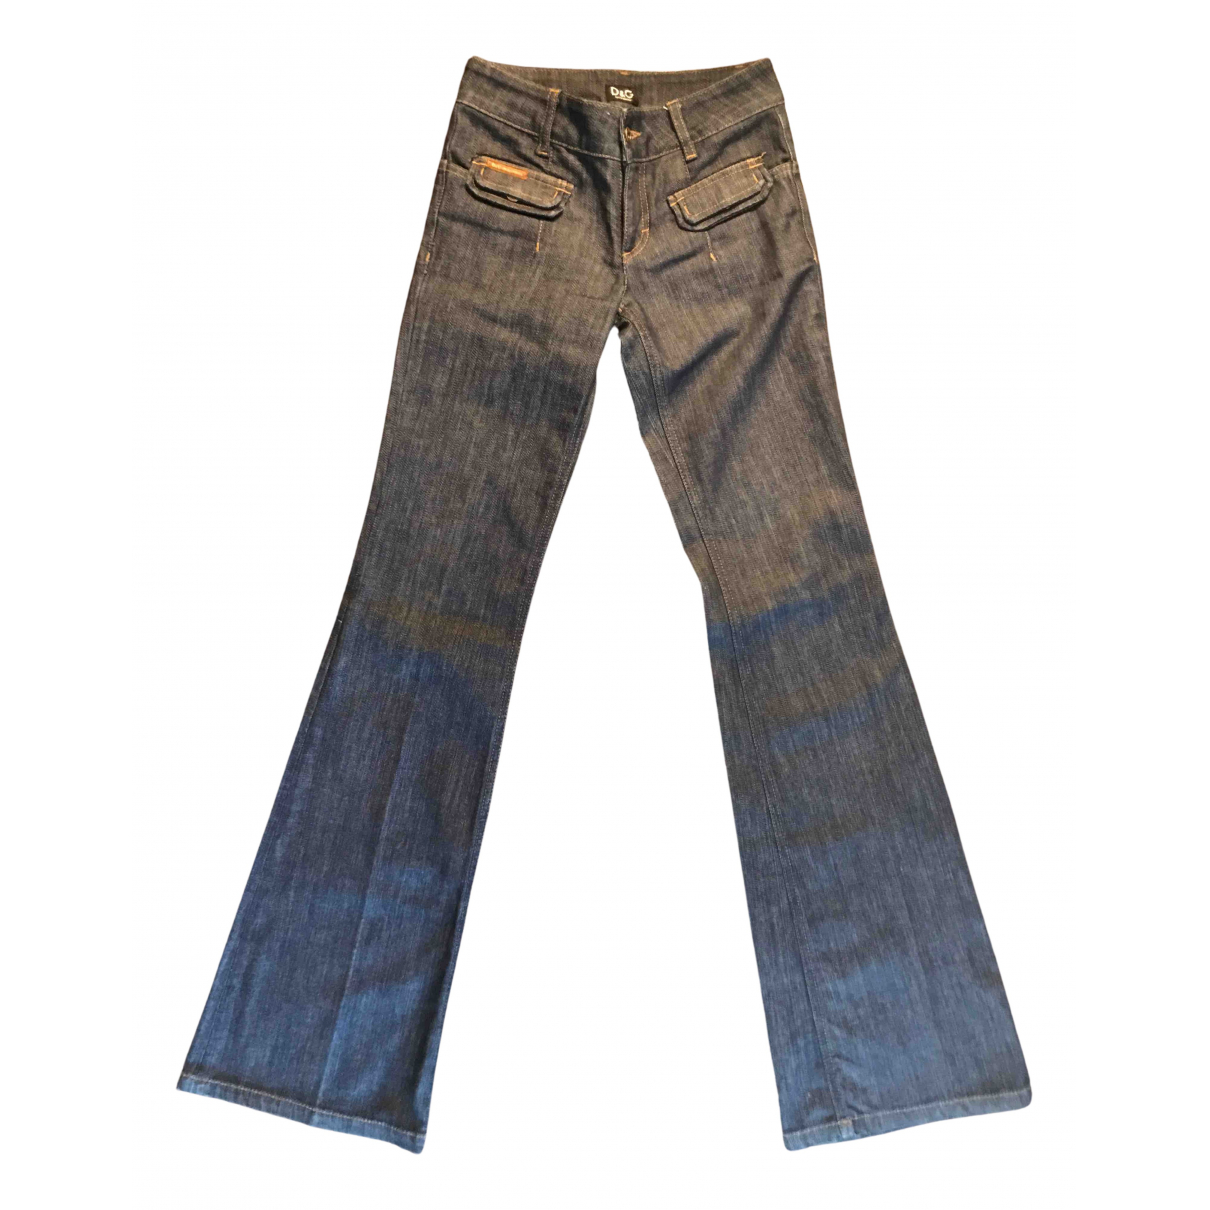 Pantalon en Denim - Vaquero Azul D&g